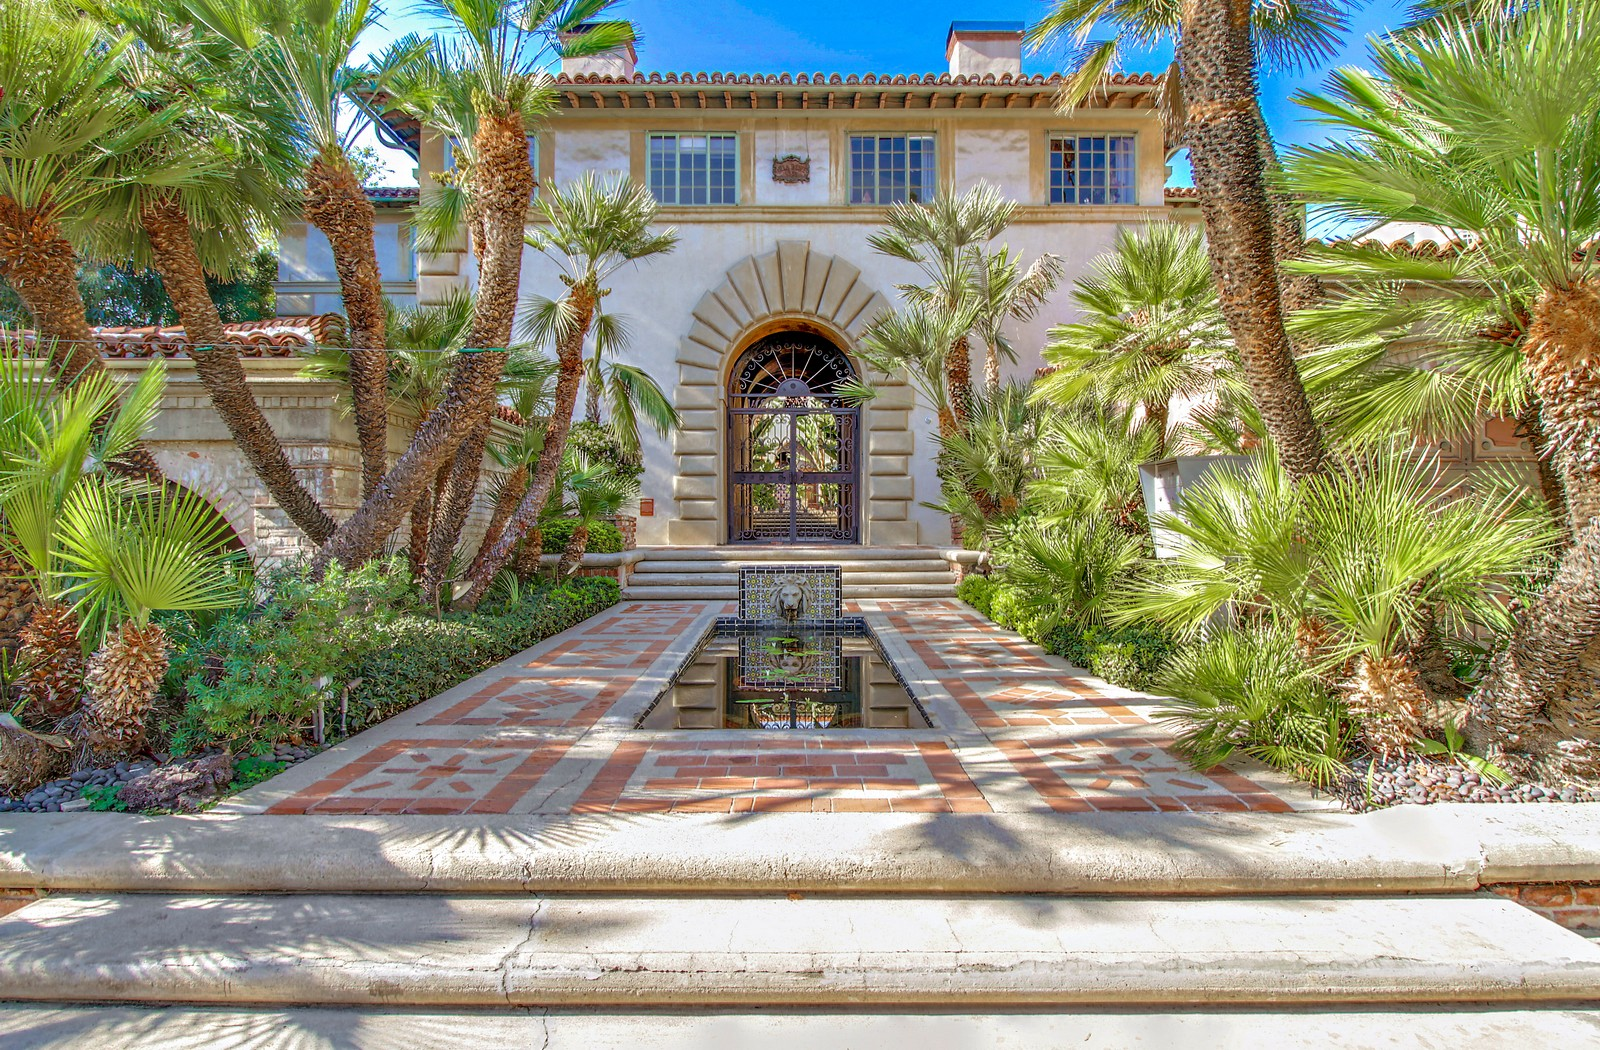 Villa dEste  Apartments in West Hollywood CA